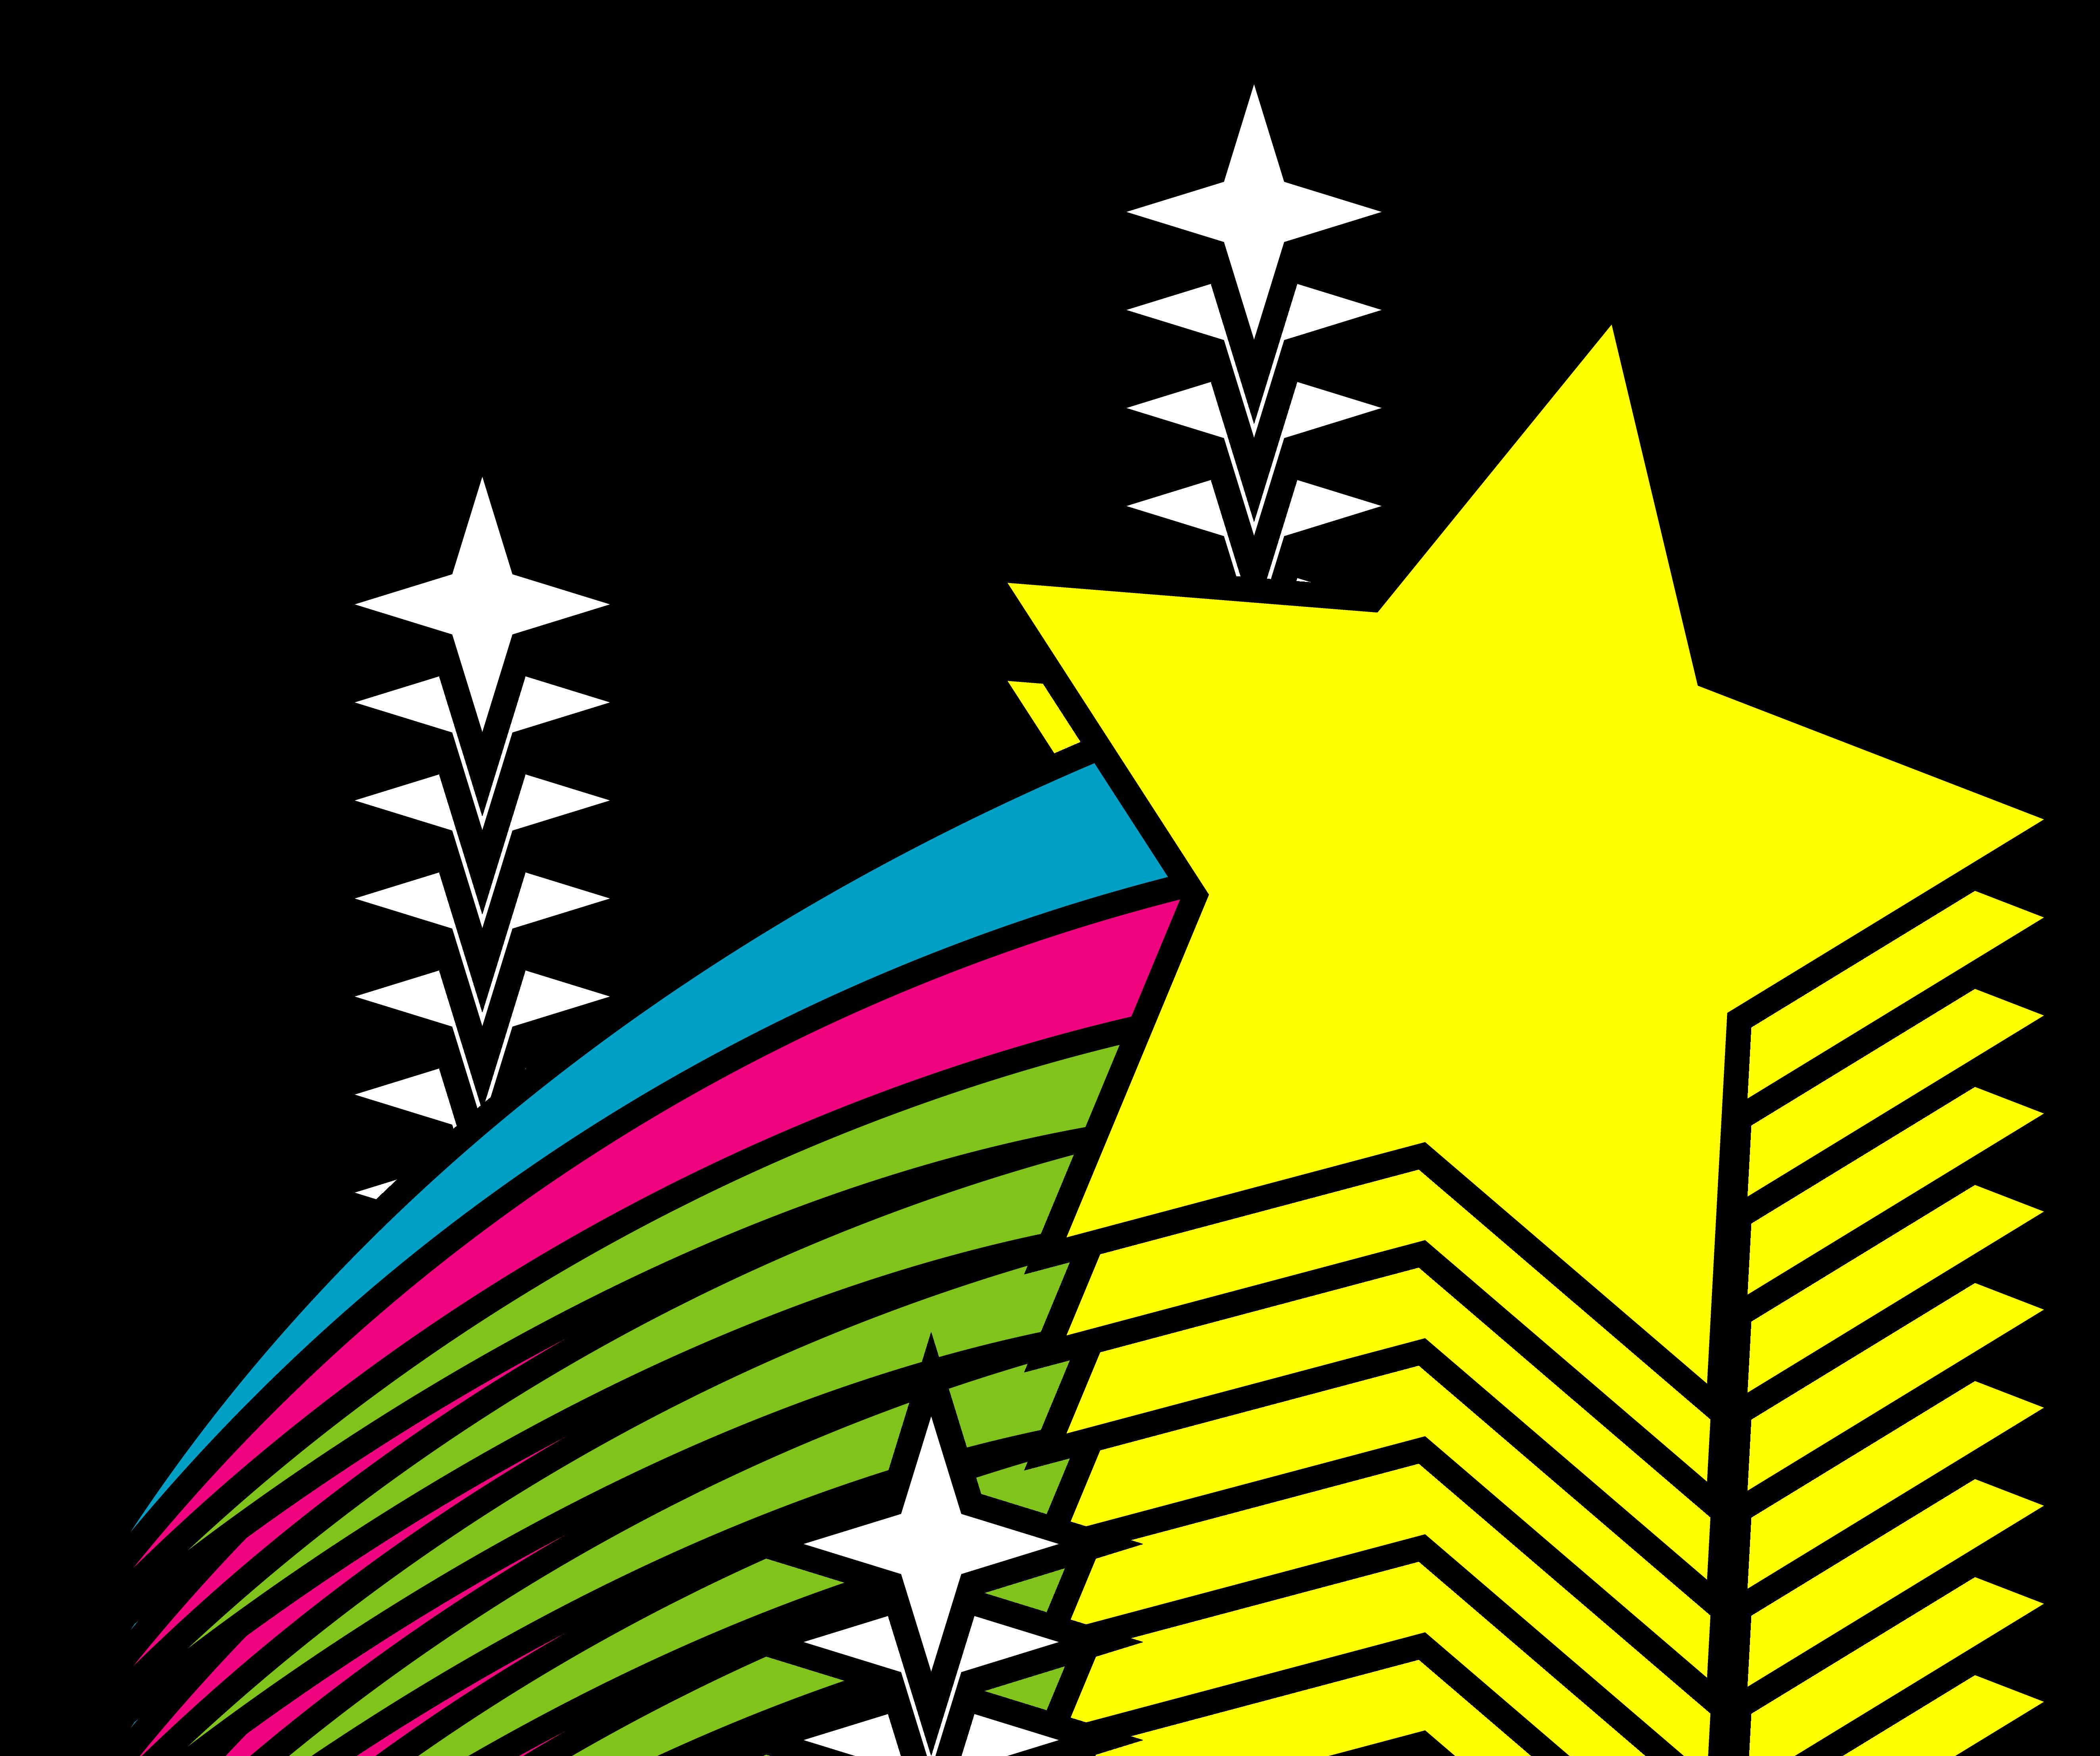 Gold clipart shooting star. Stars panda free images